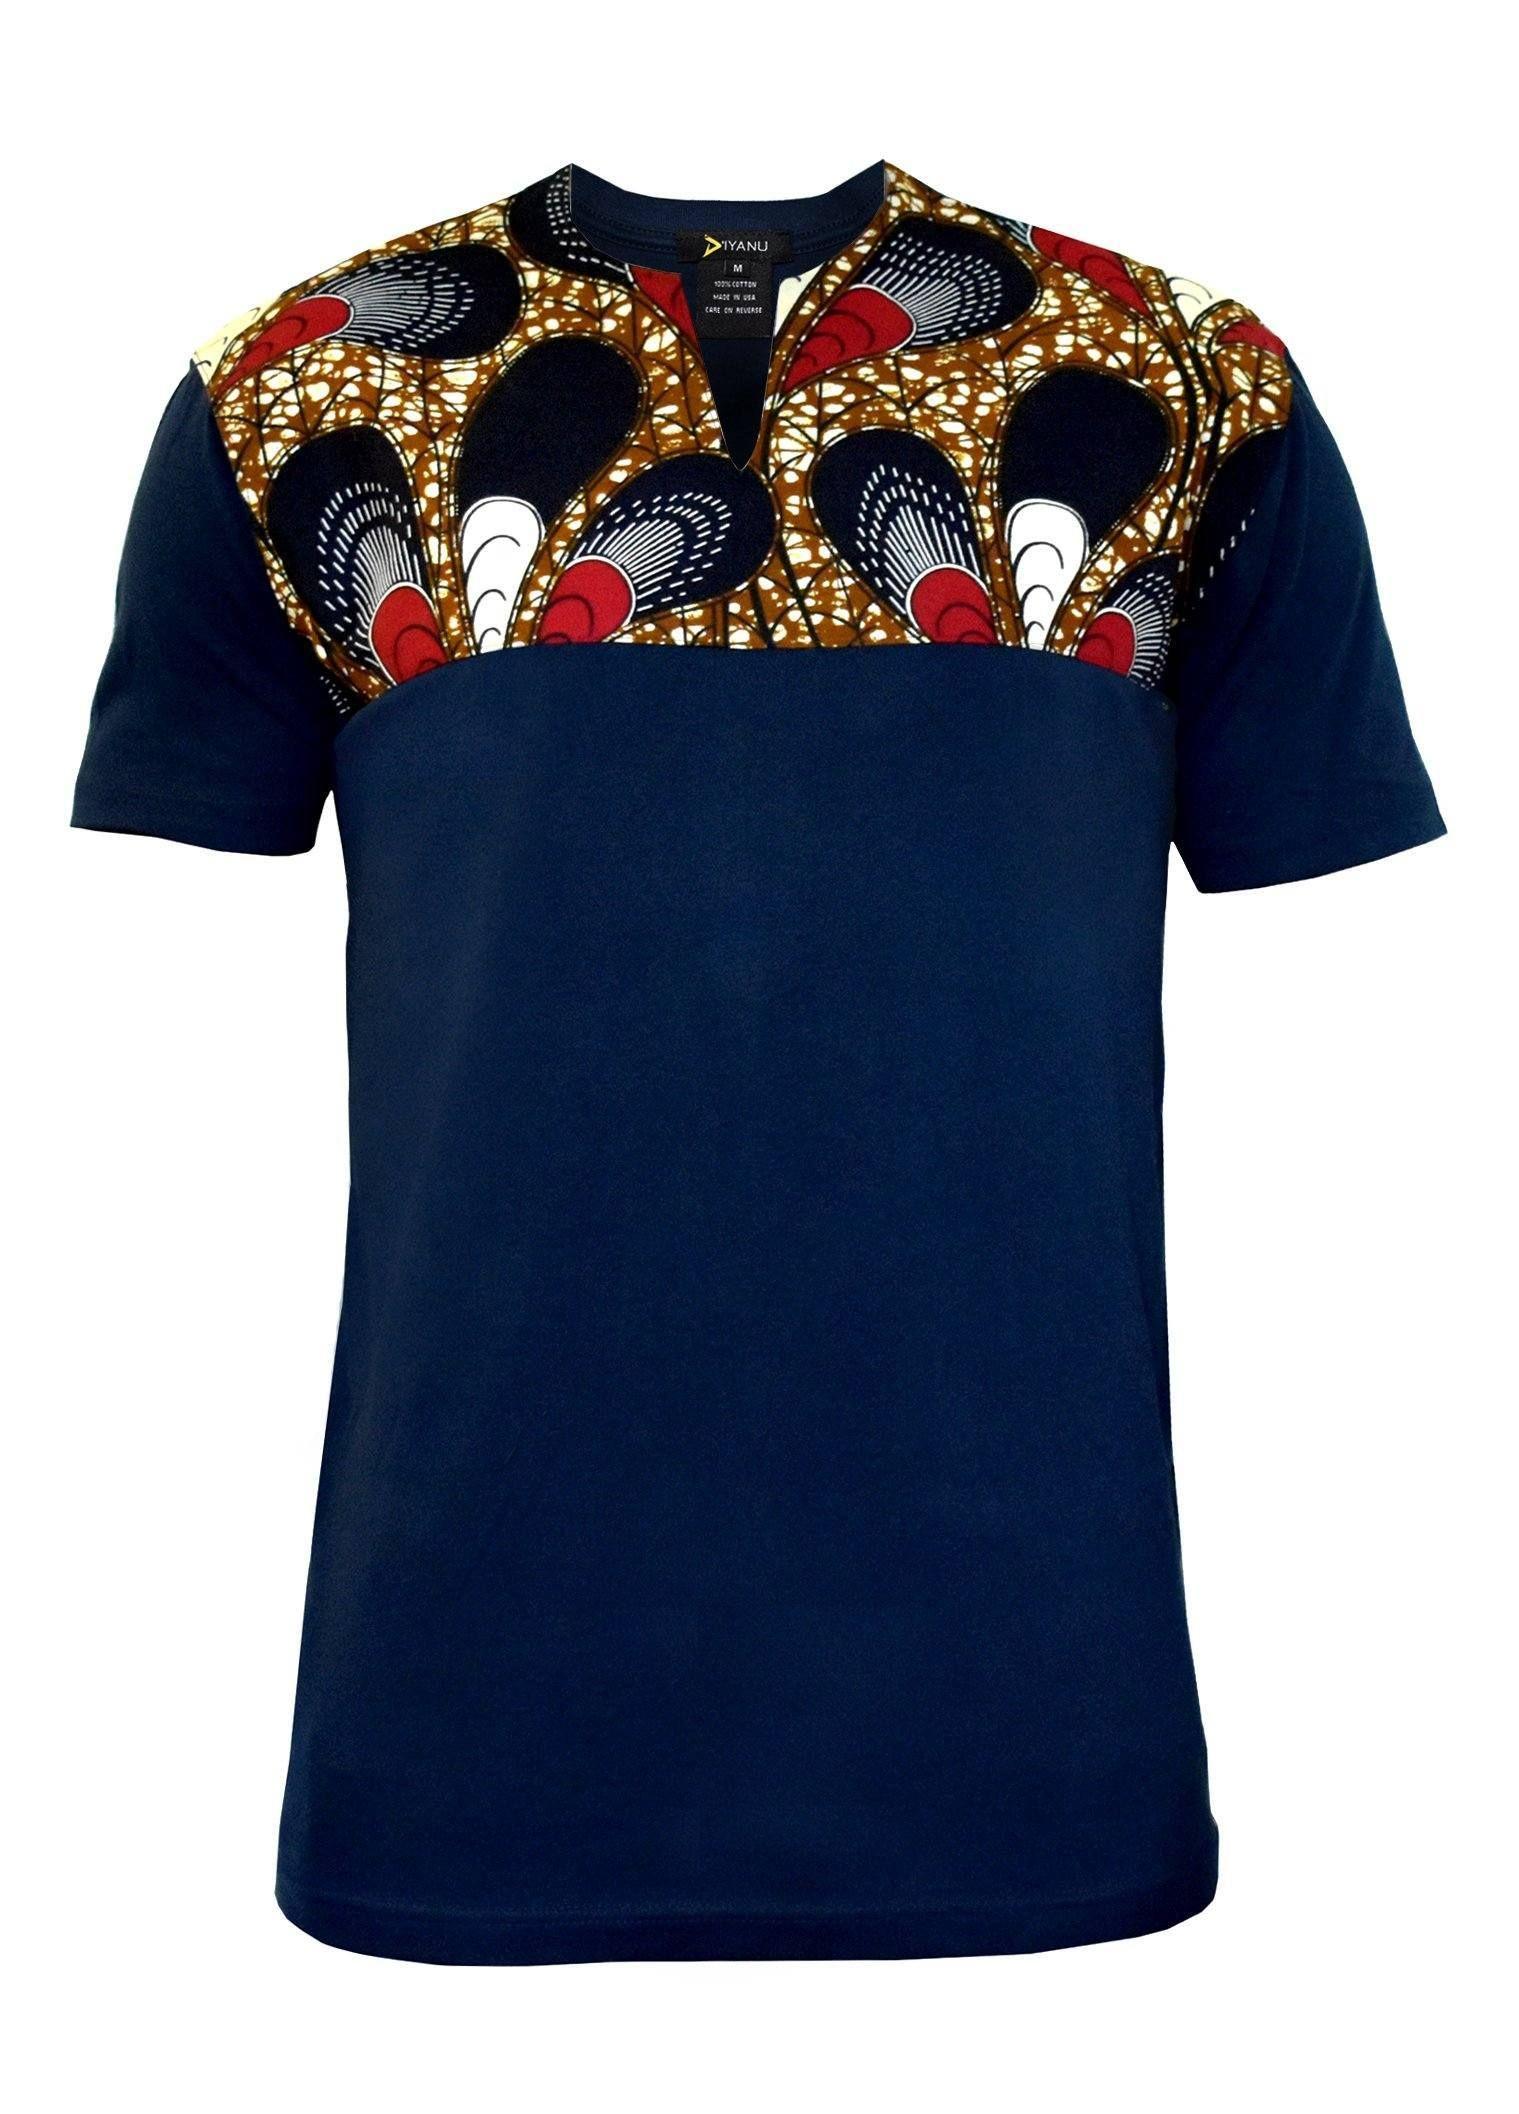 Dayo Men's African Print T Shirt (RedNavyWhite Peacock